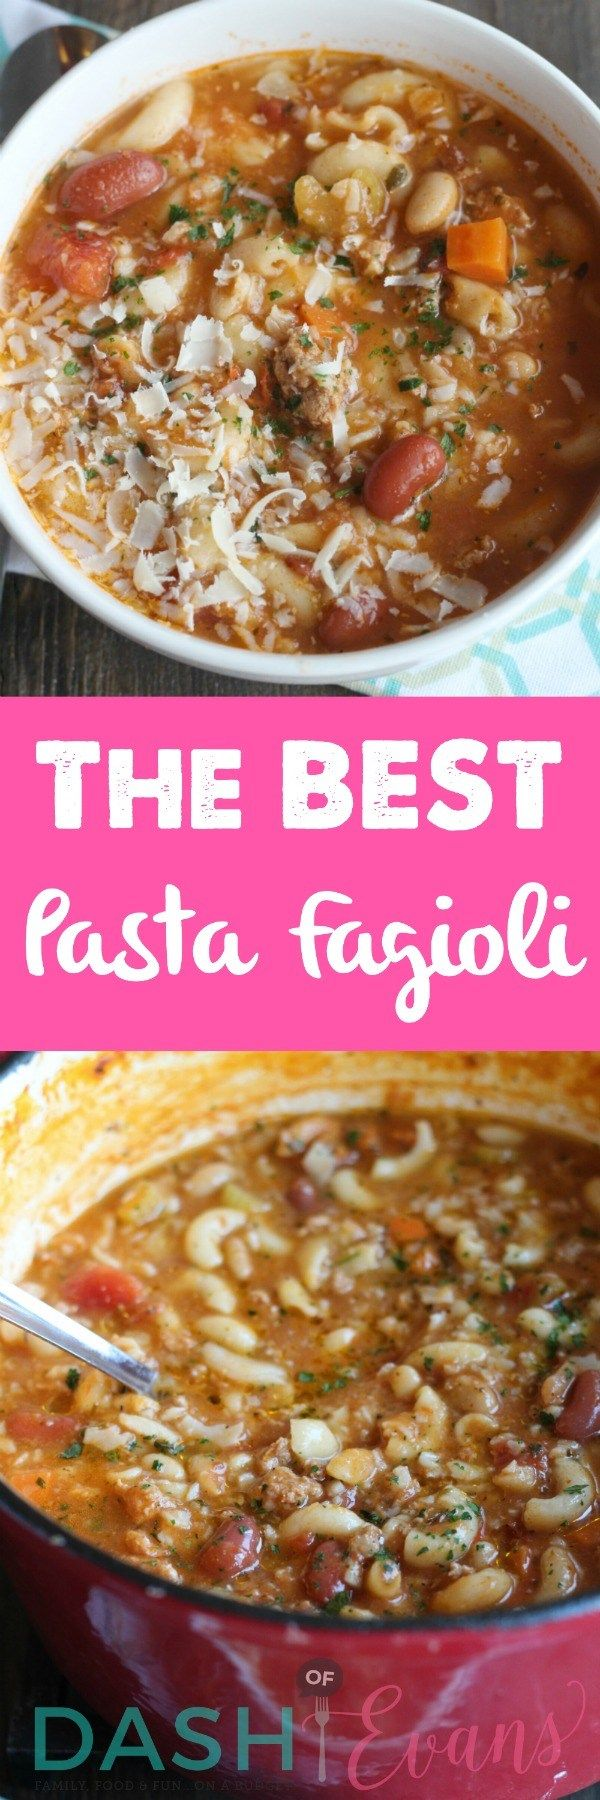 Pasta Fagioli using Randall Mixed Beans. SO hearty and delish! via @DashOfEvans